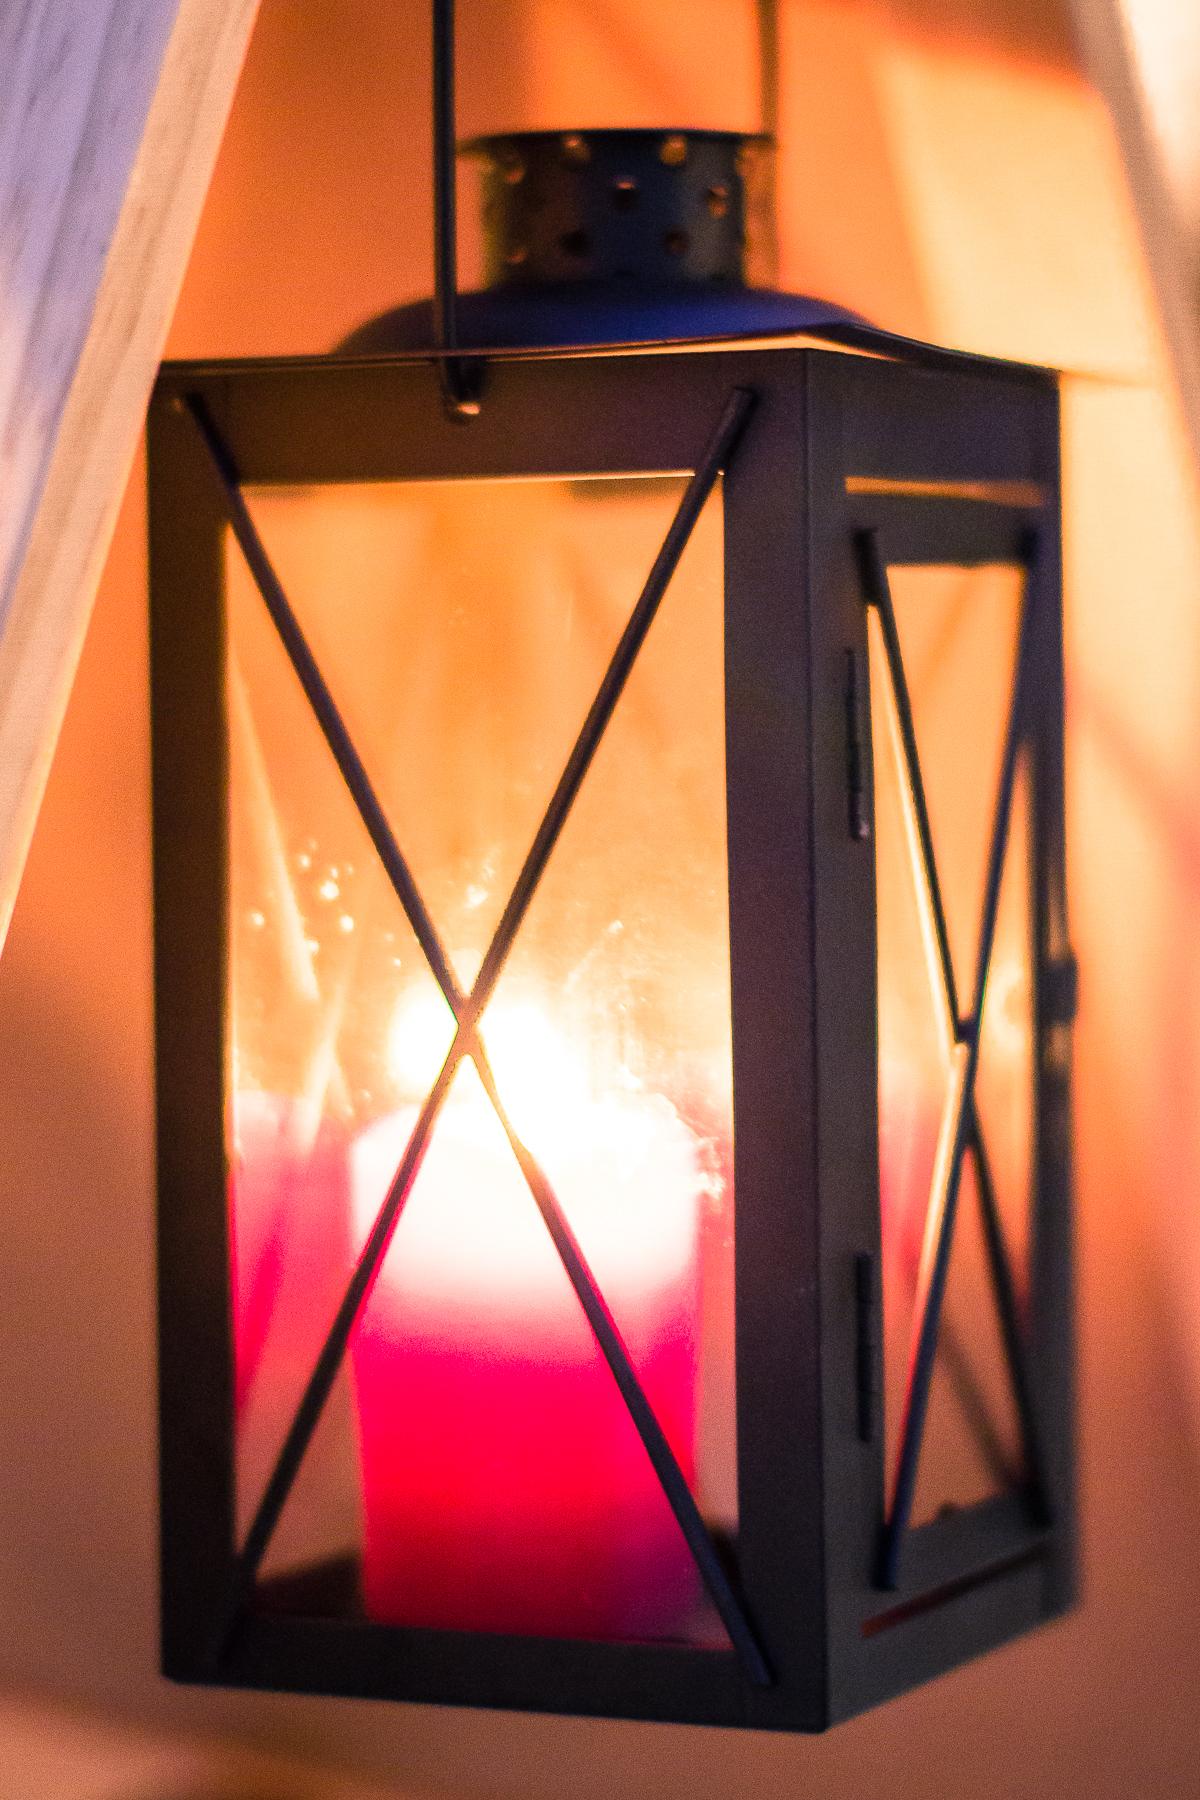 Lantern With Red Candle Via @Atisgailis